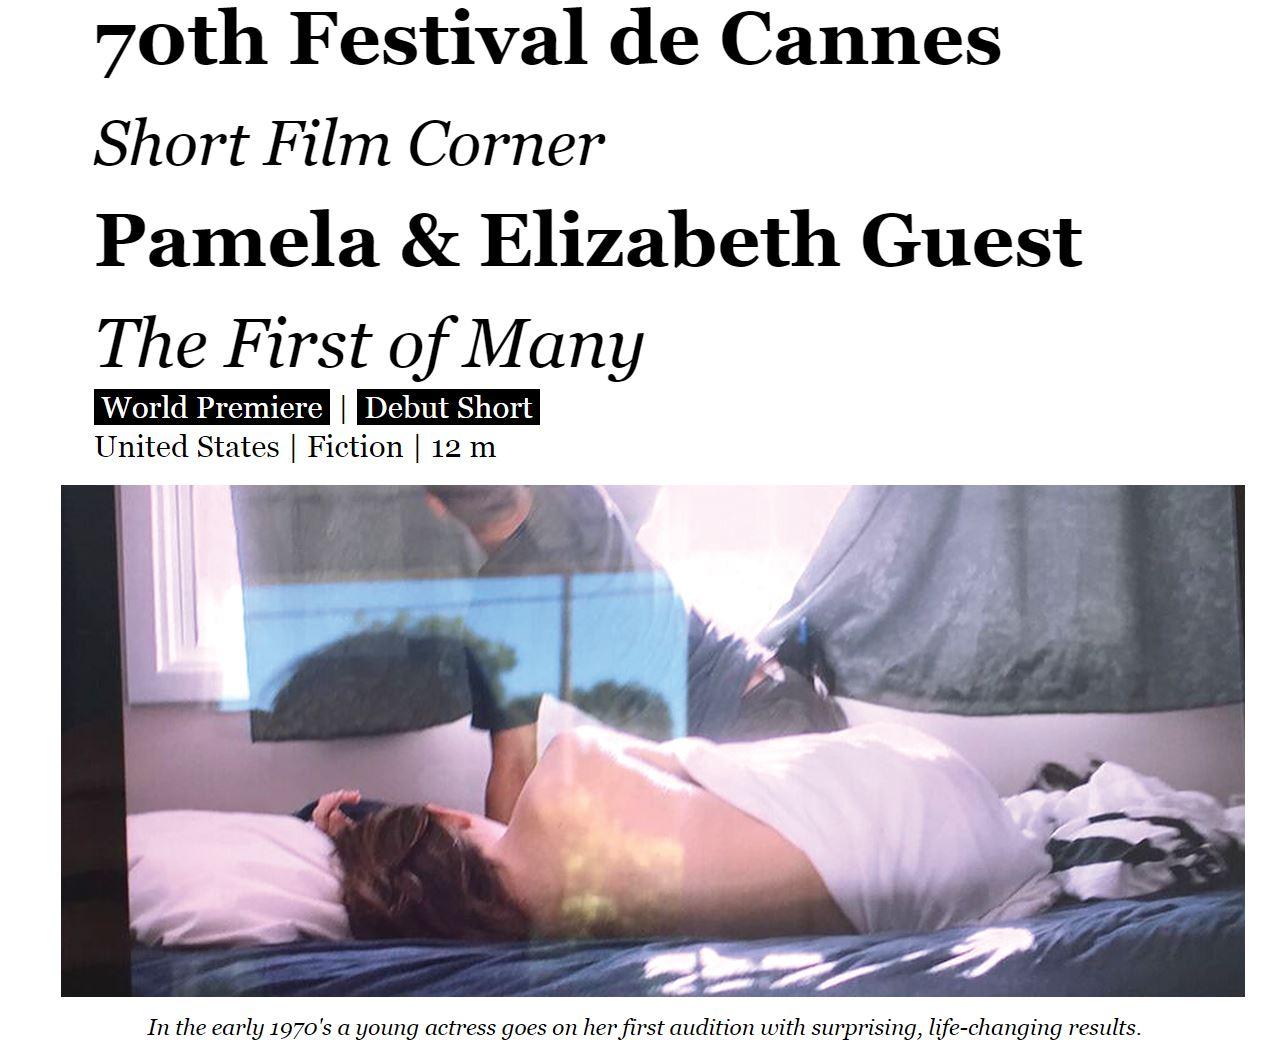 Pamela & Elizabeth Guest, Membership First, SAGAFTRA, The First Of Many, Sexual Harrasment, cannes.JPG